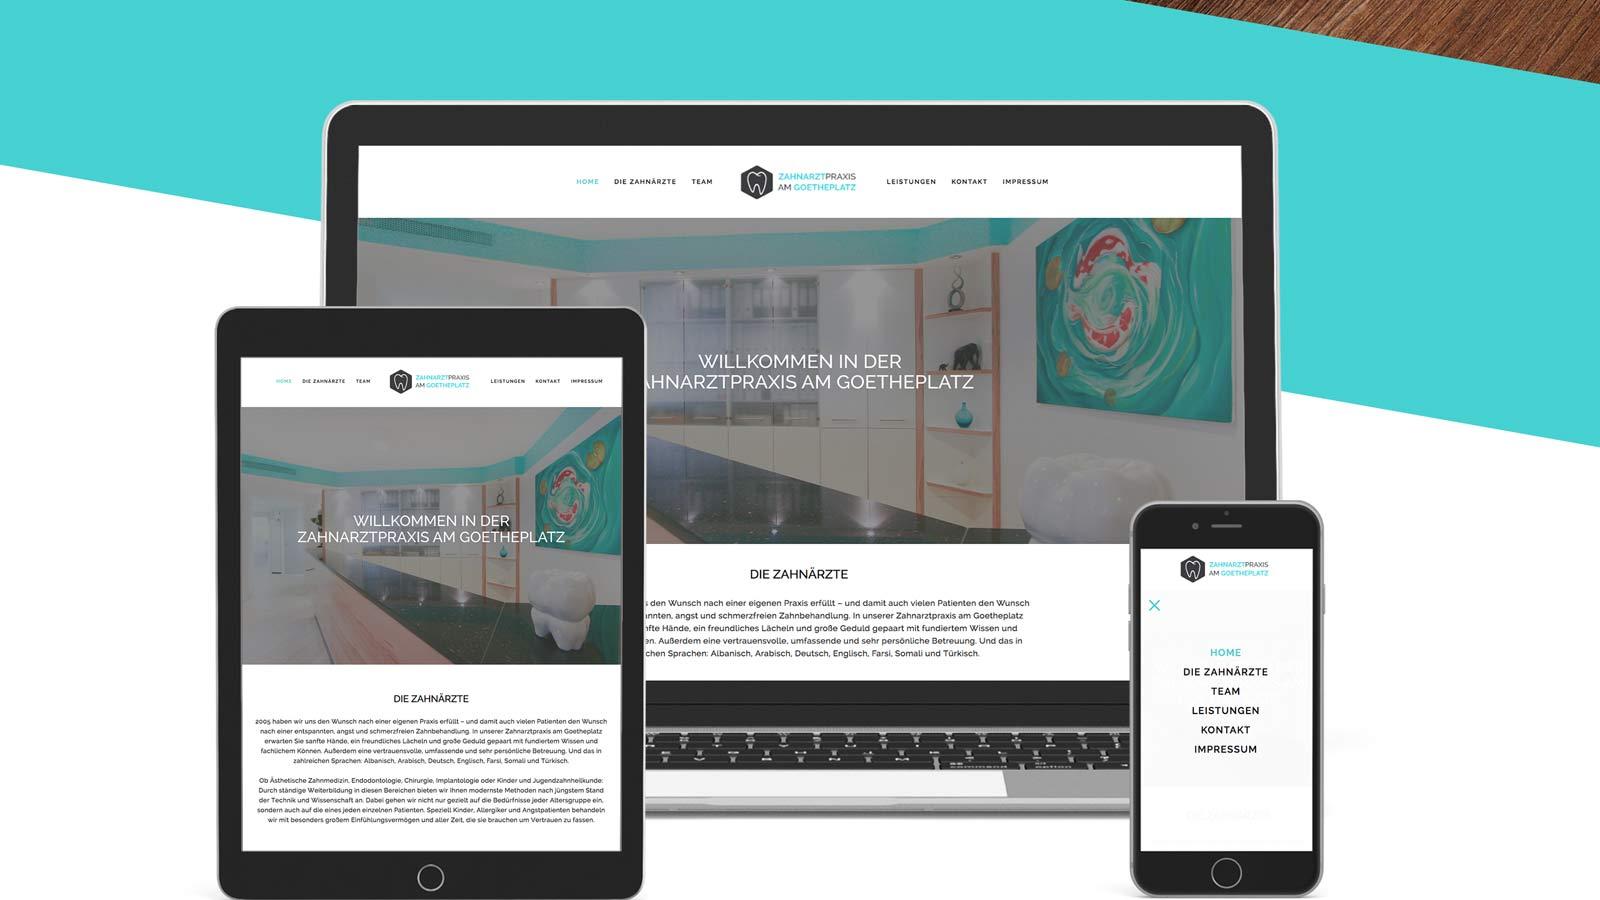 Zahnarzt_am_Goetheplatz_Responsive_Webdesign_2.jpg